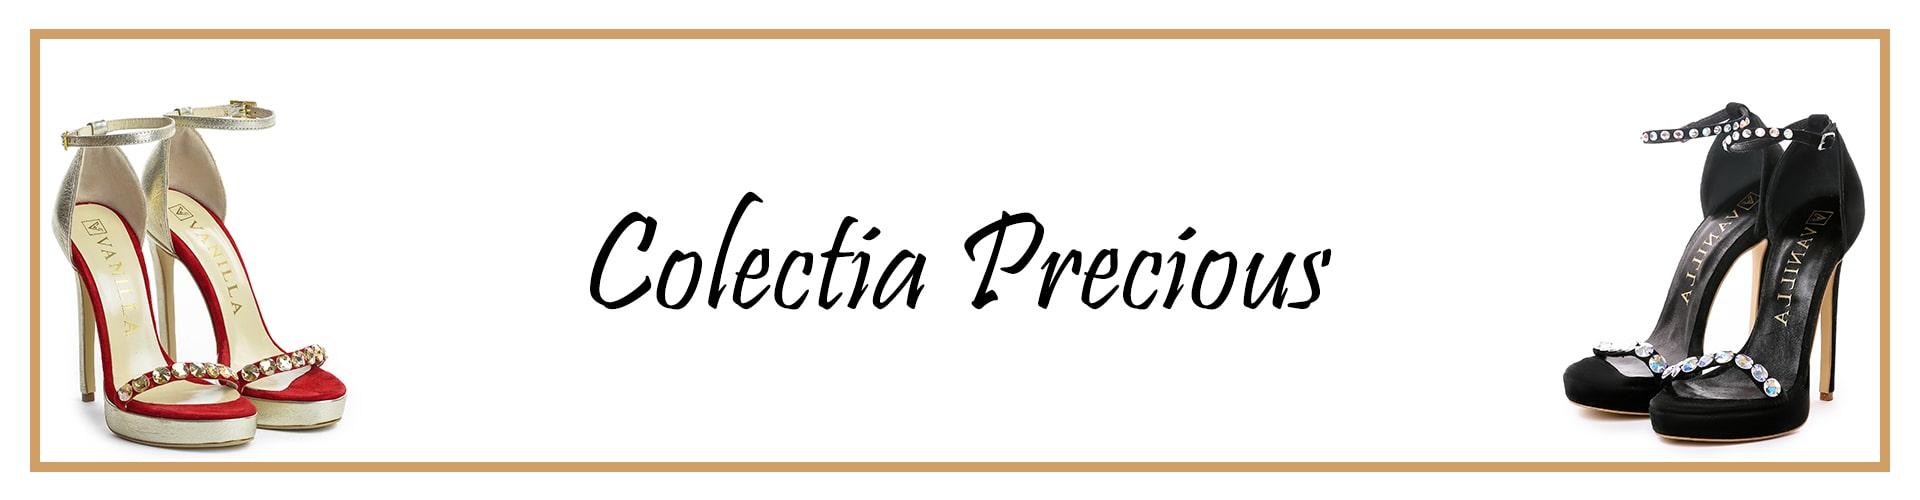 Colectia Precious Vanilla ®